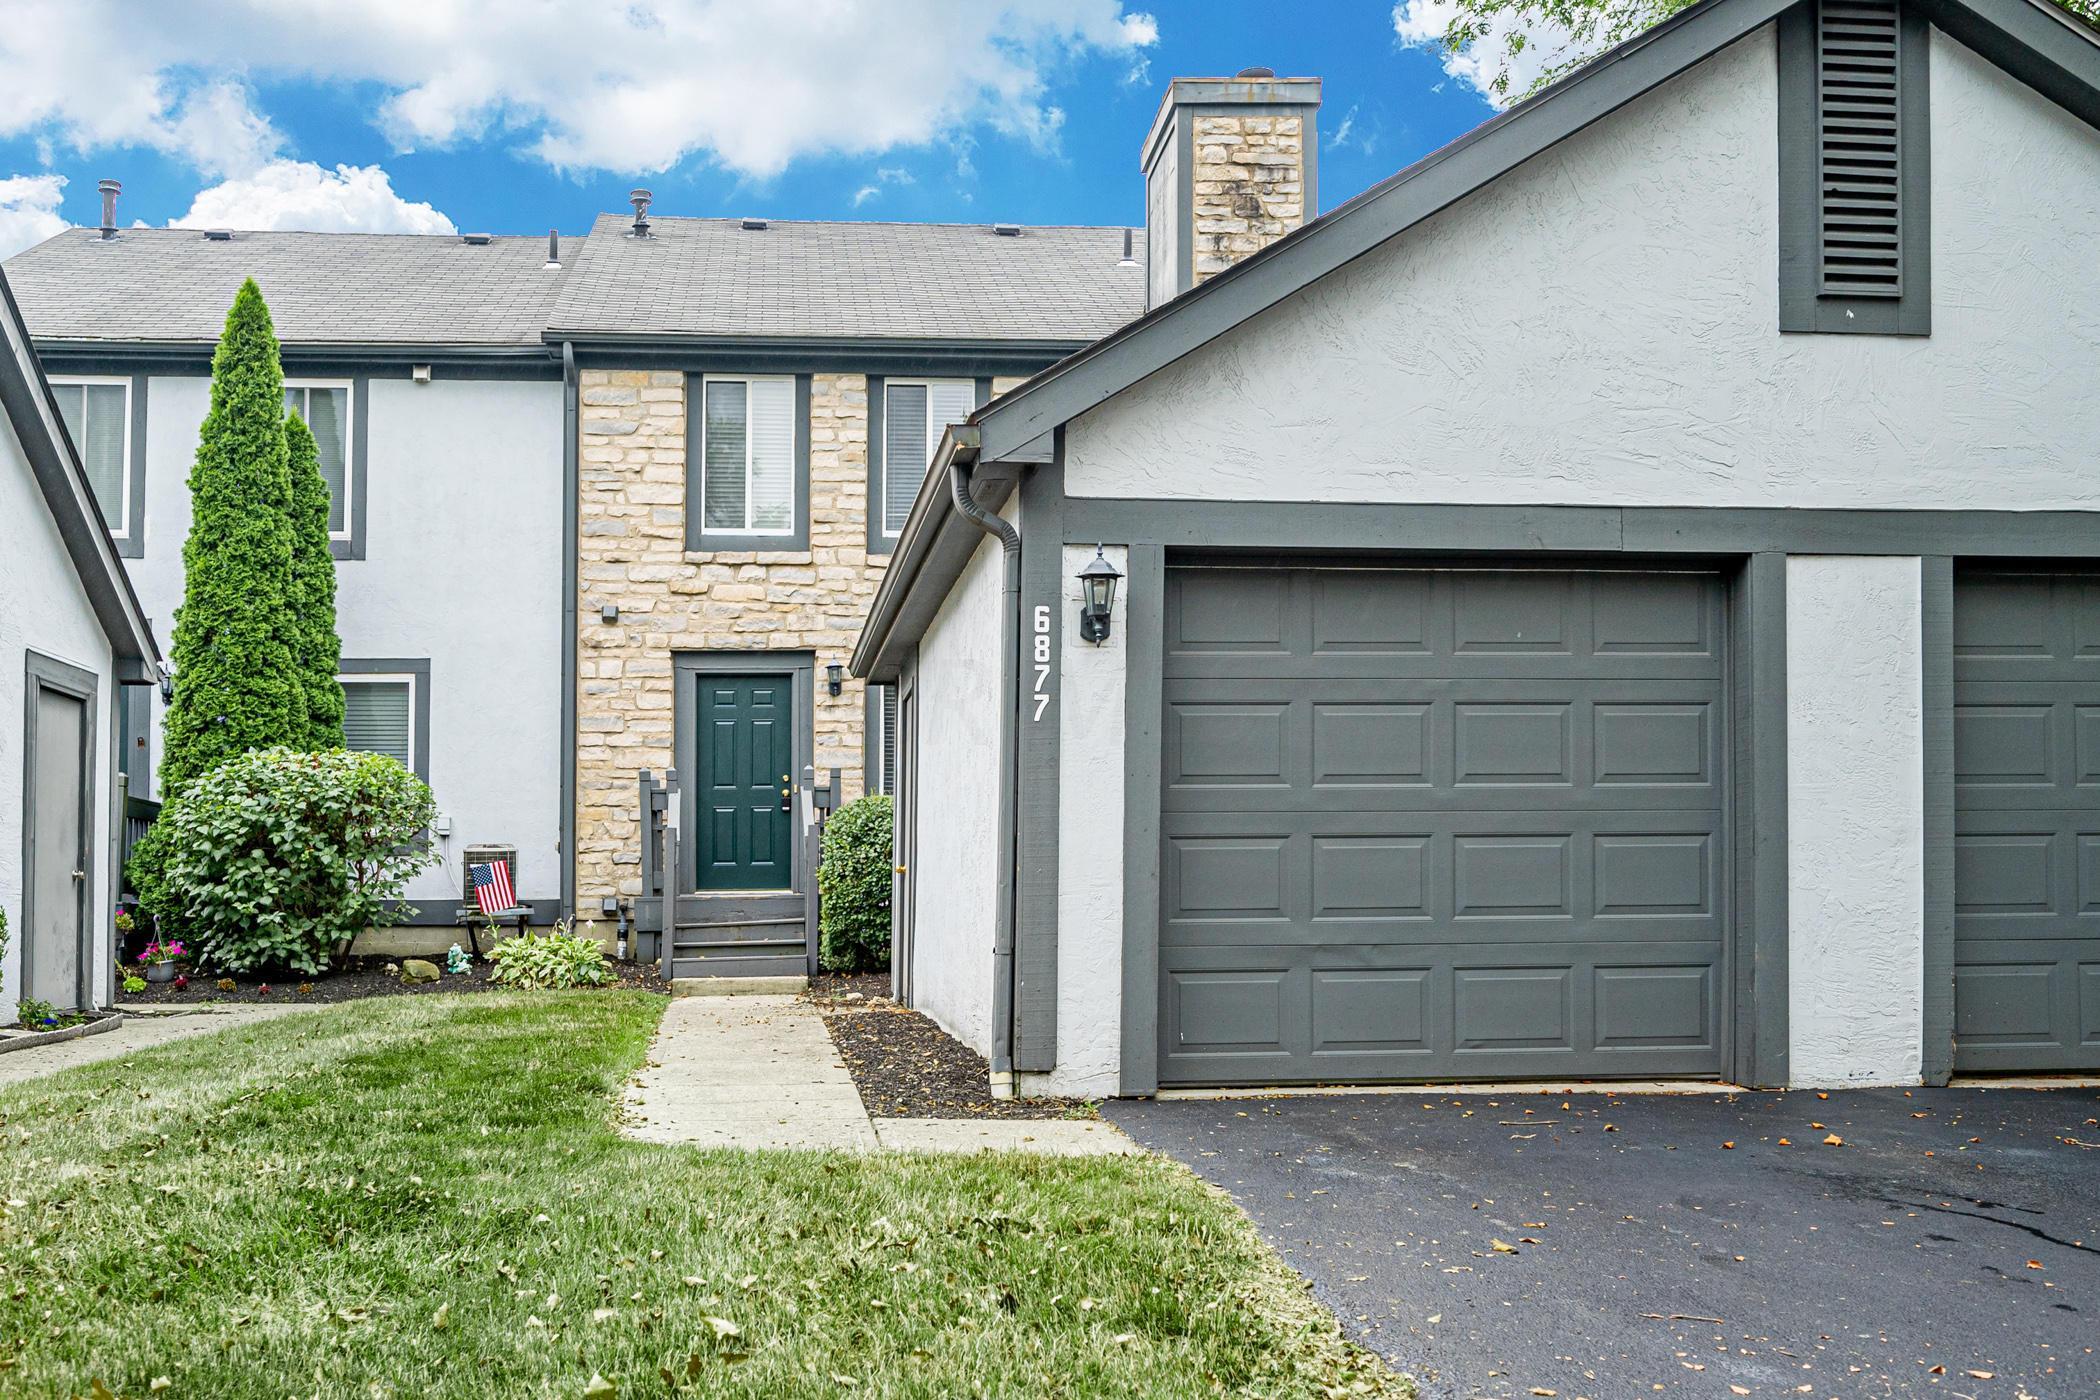 6877 Muirfield Drive, Dublin, Ohio 43017, 2 Bedrooms Bedrooms, ,3 BathroomsBathrooms,Residential,For Sale,Muirfield,220024617